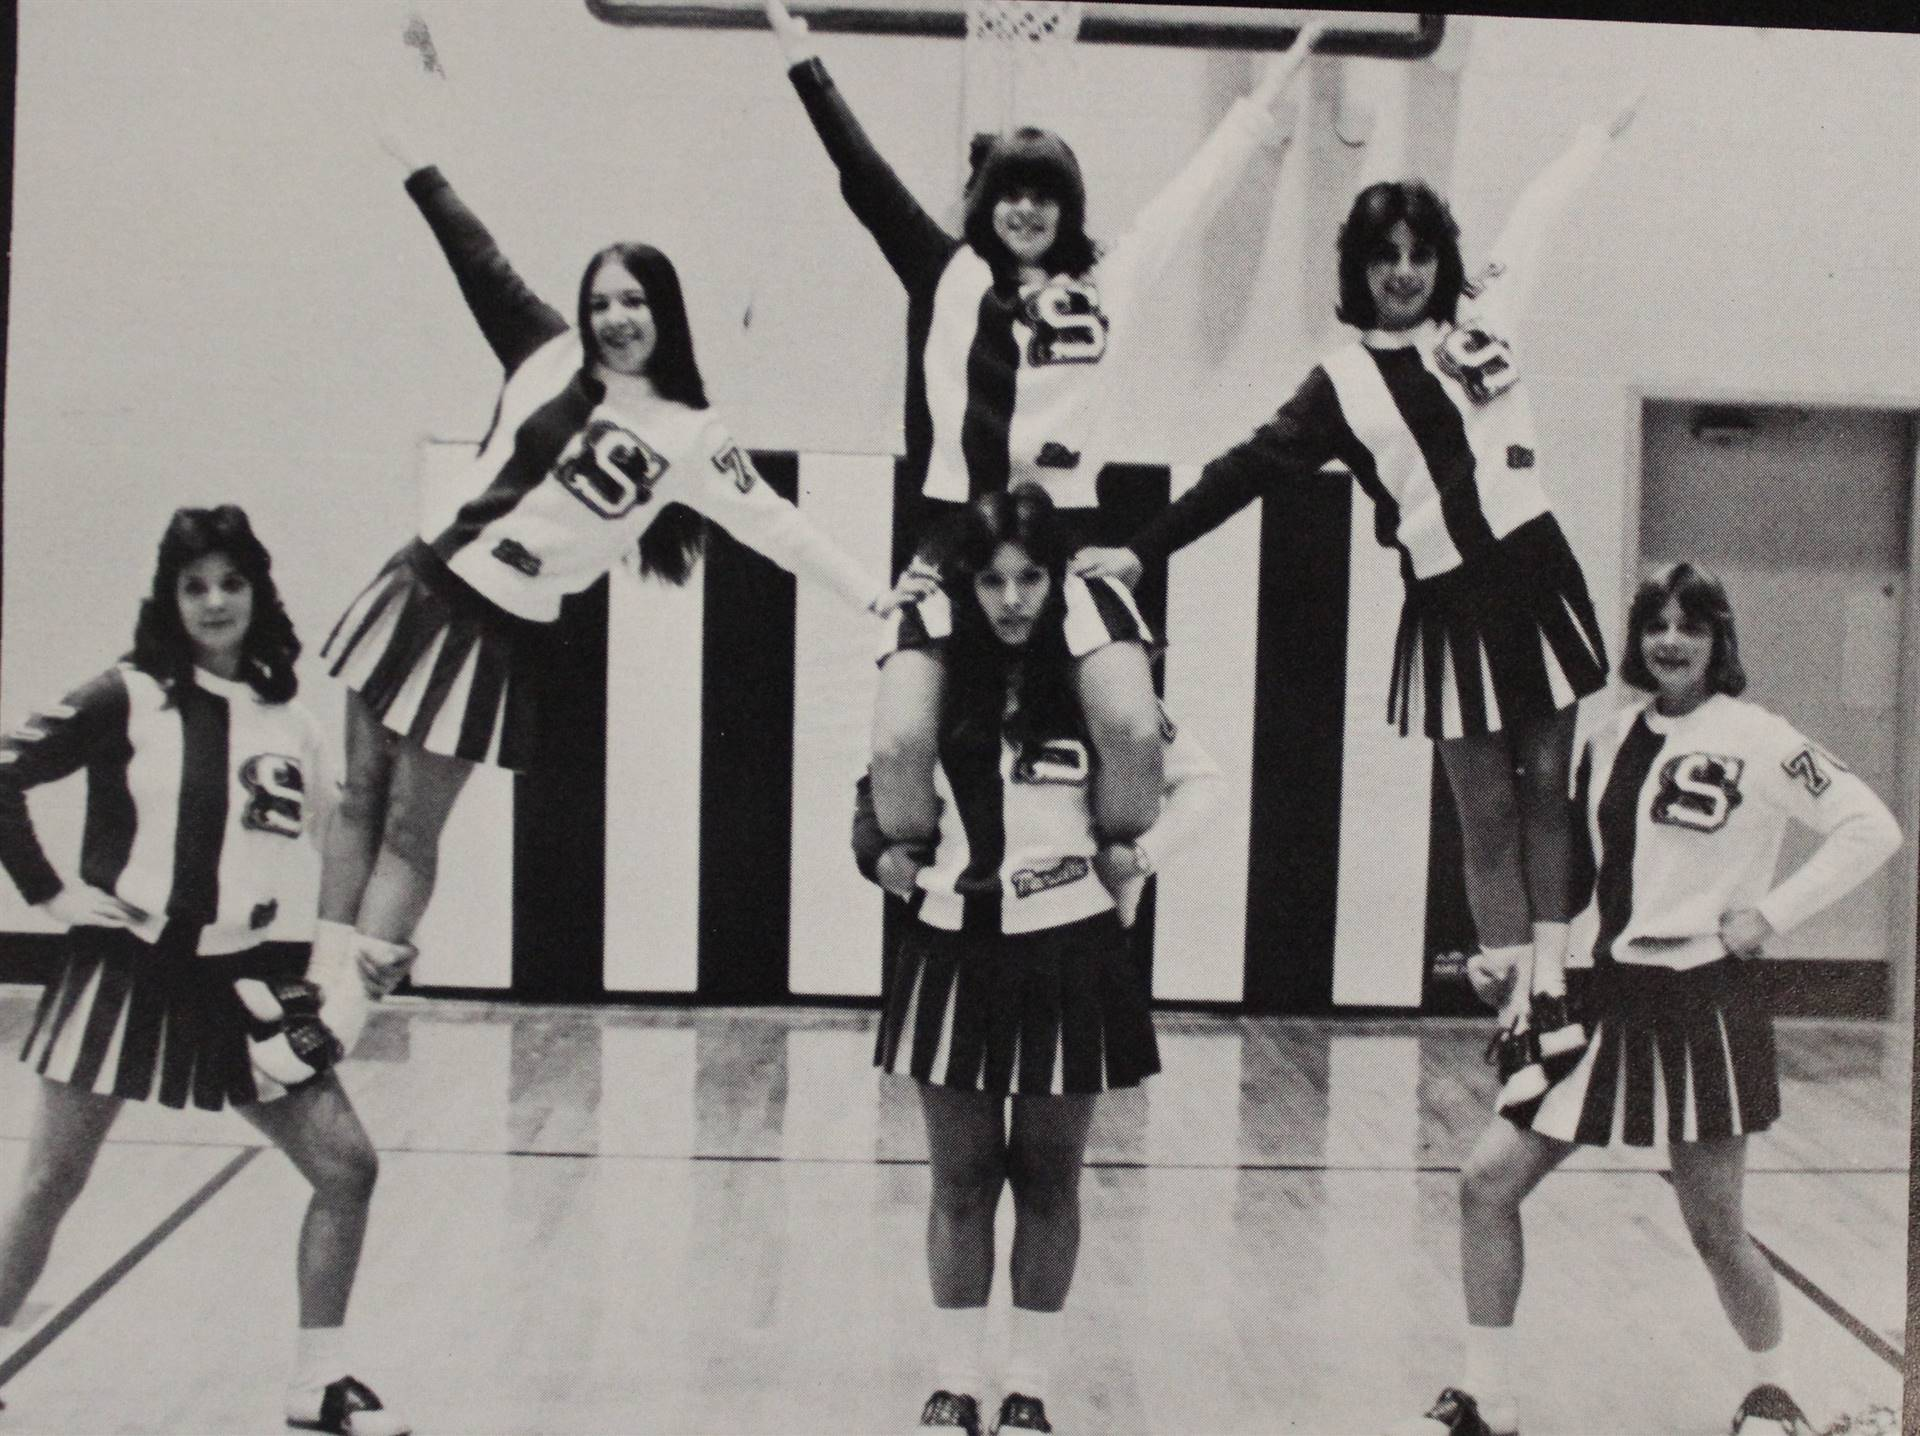 1977 Cheer